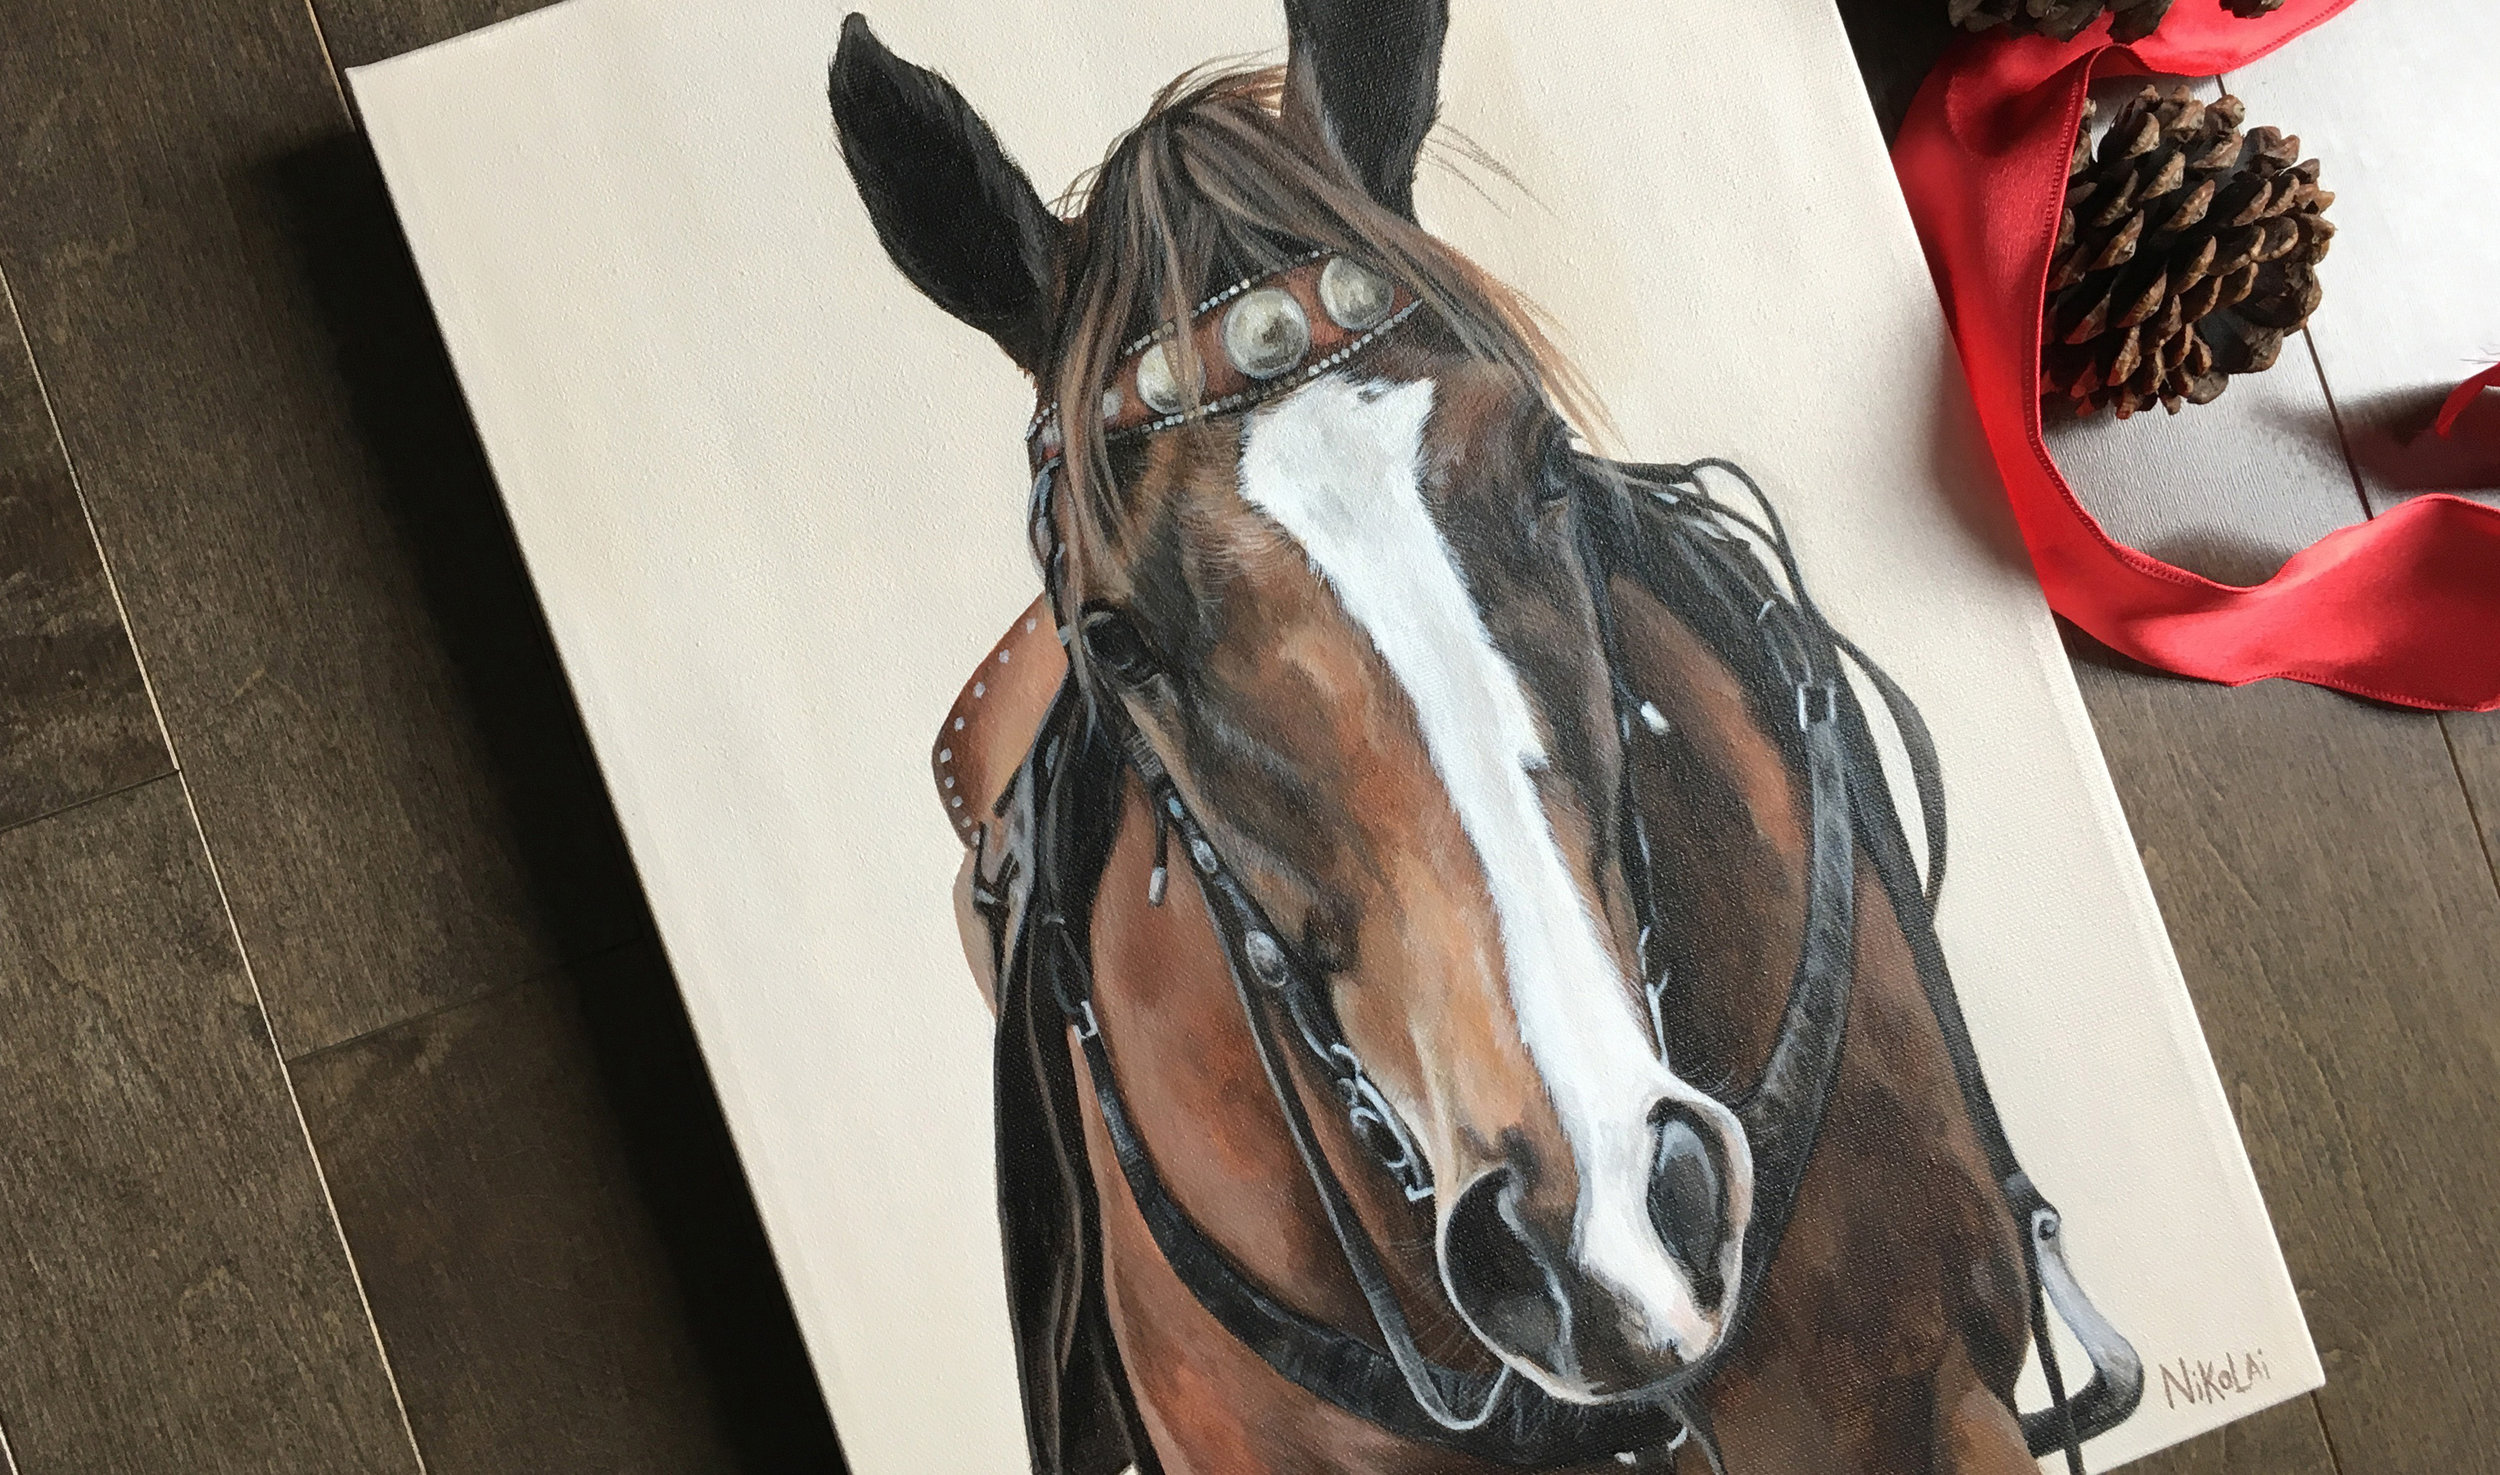 Springsteen (Quarter Horse) portrait painting